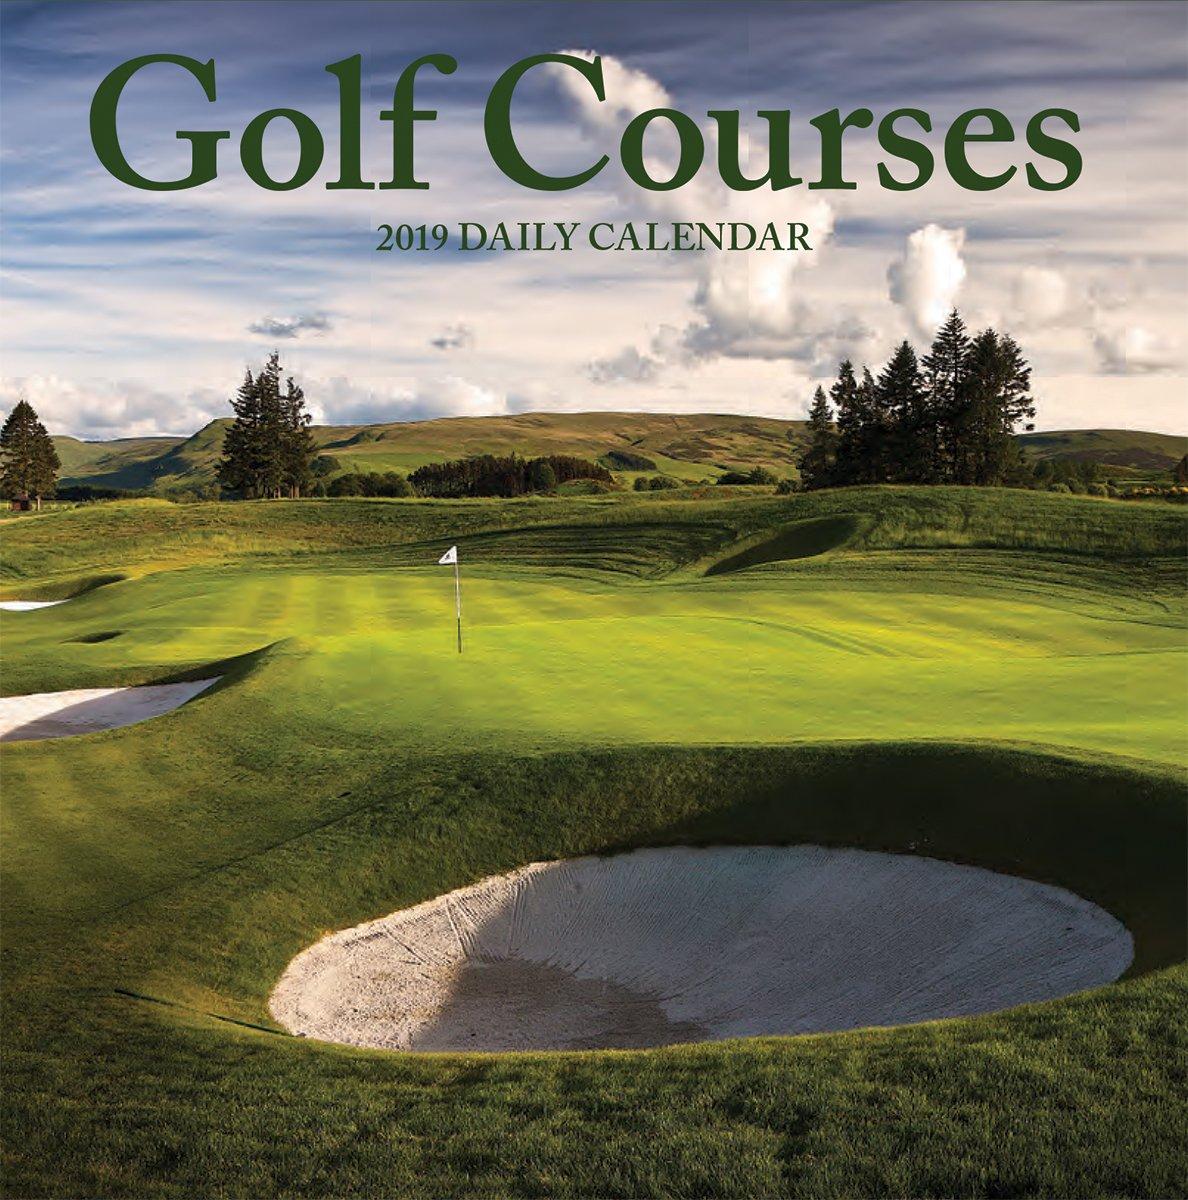 Turner Photo Golf Courses 2019 Photo Daily Boxed (199989700030 Desk Calendar (19998970003)